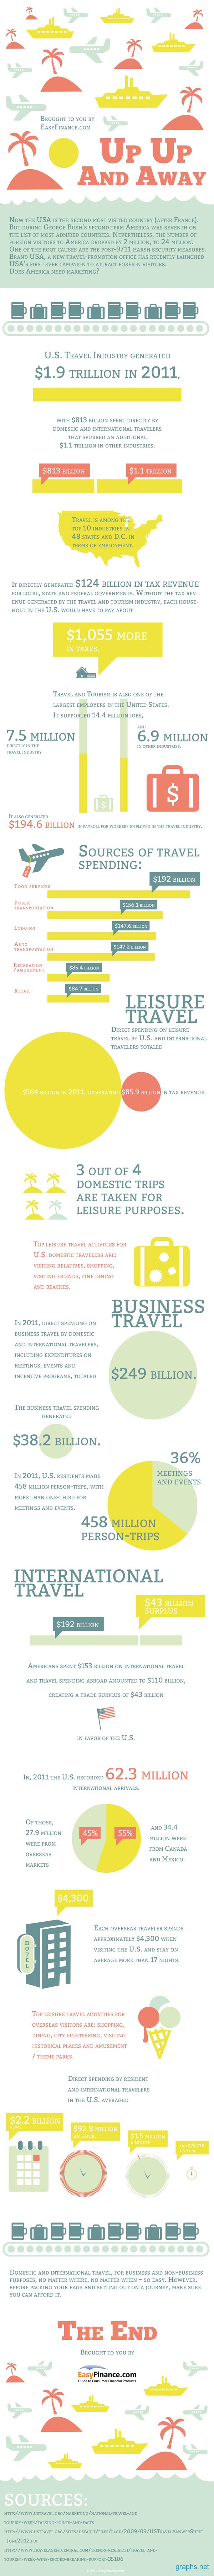 Travel Industry in America